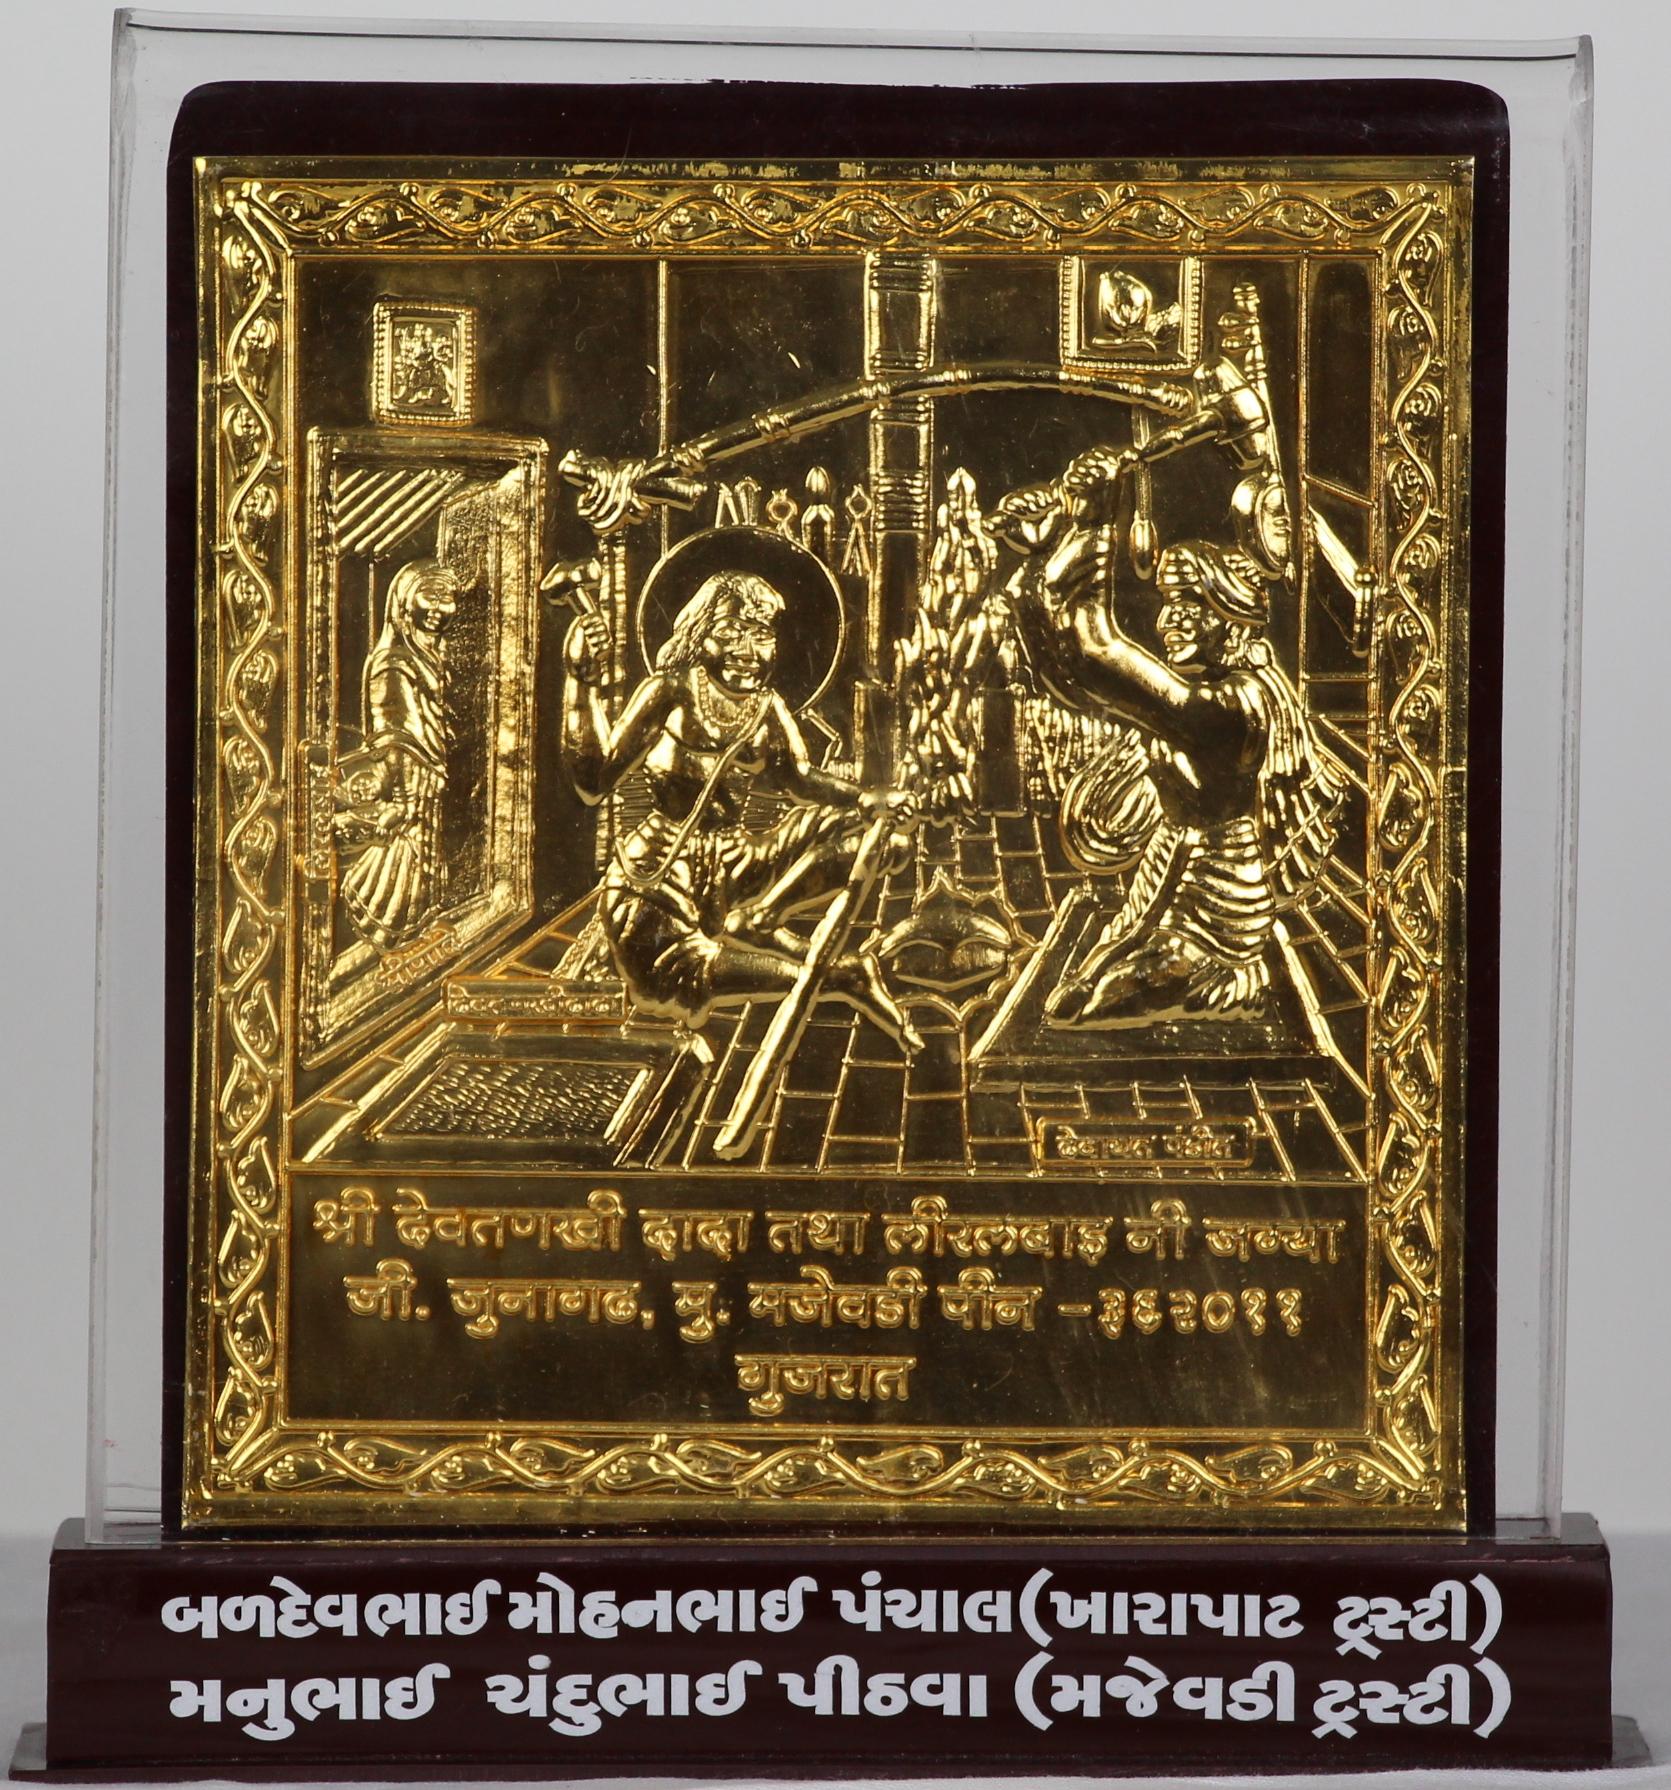 Award of Appreciation, from the Trustees of Shri Devat Gadi Dada and Liral Dai